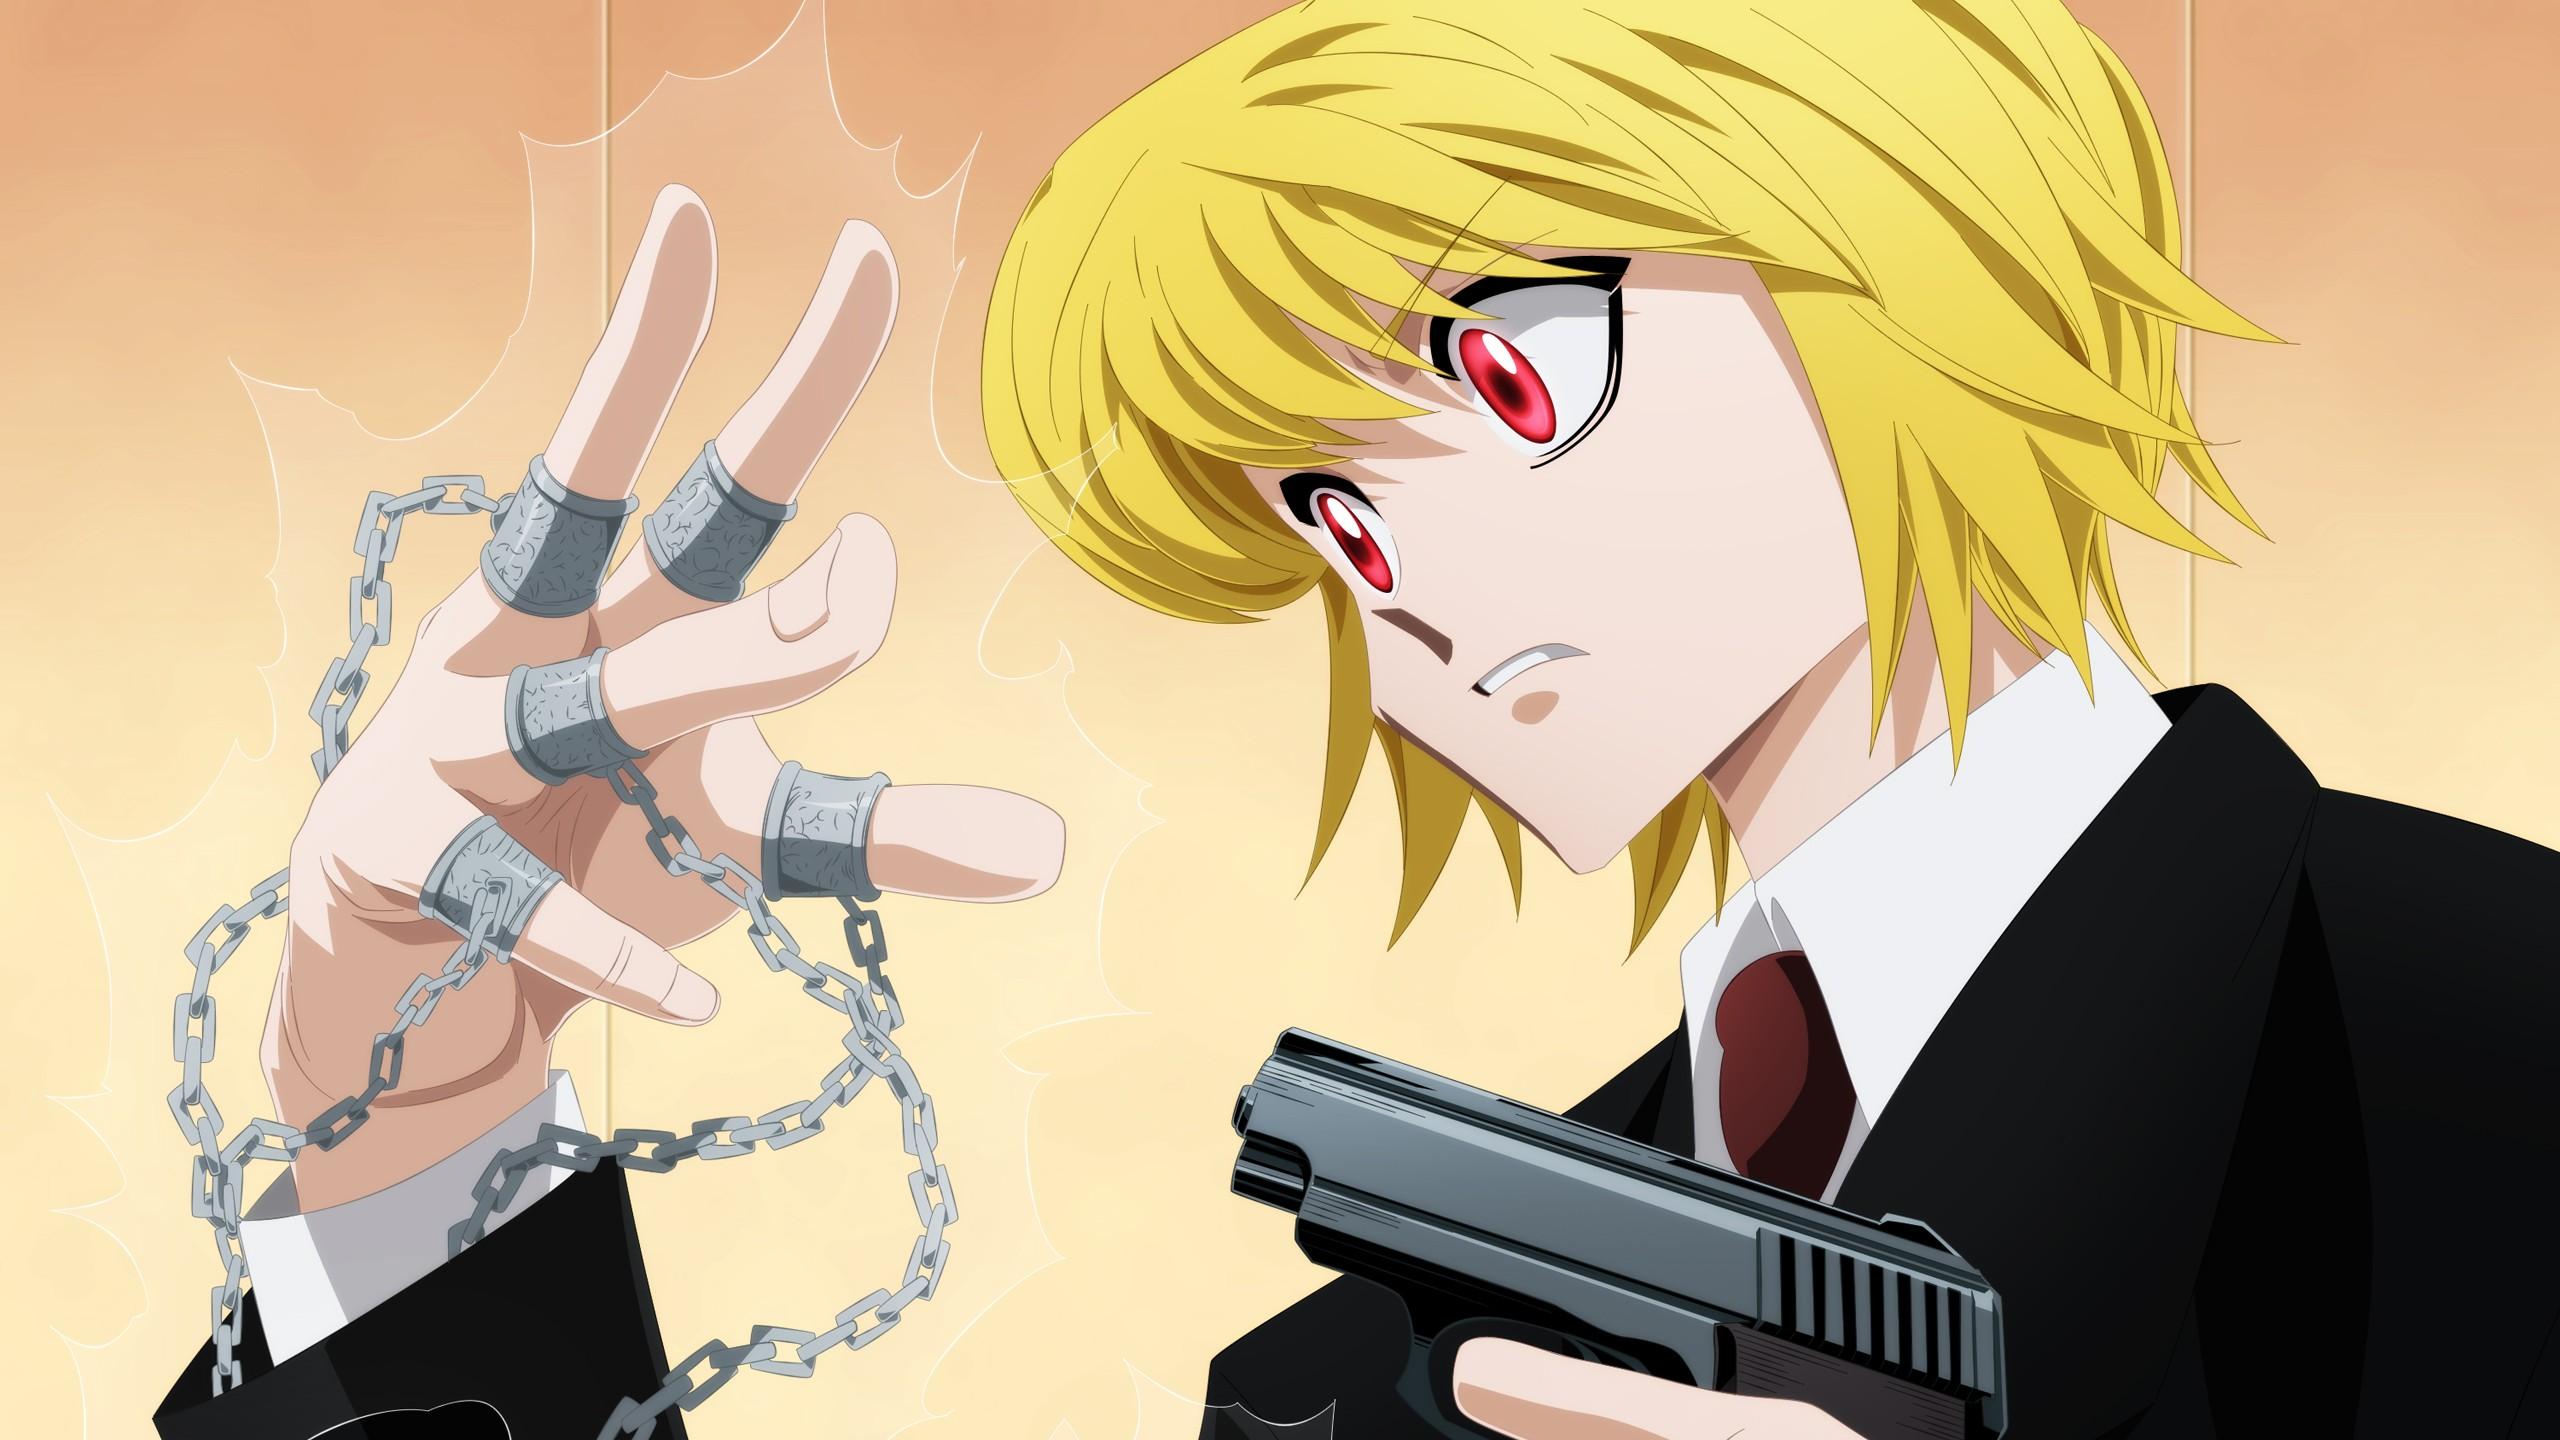 Hunter x hunter iphone x wallpapers. Hunter x Hunter Kurapika HD Anime Wallpapers | HD ...